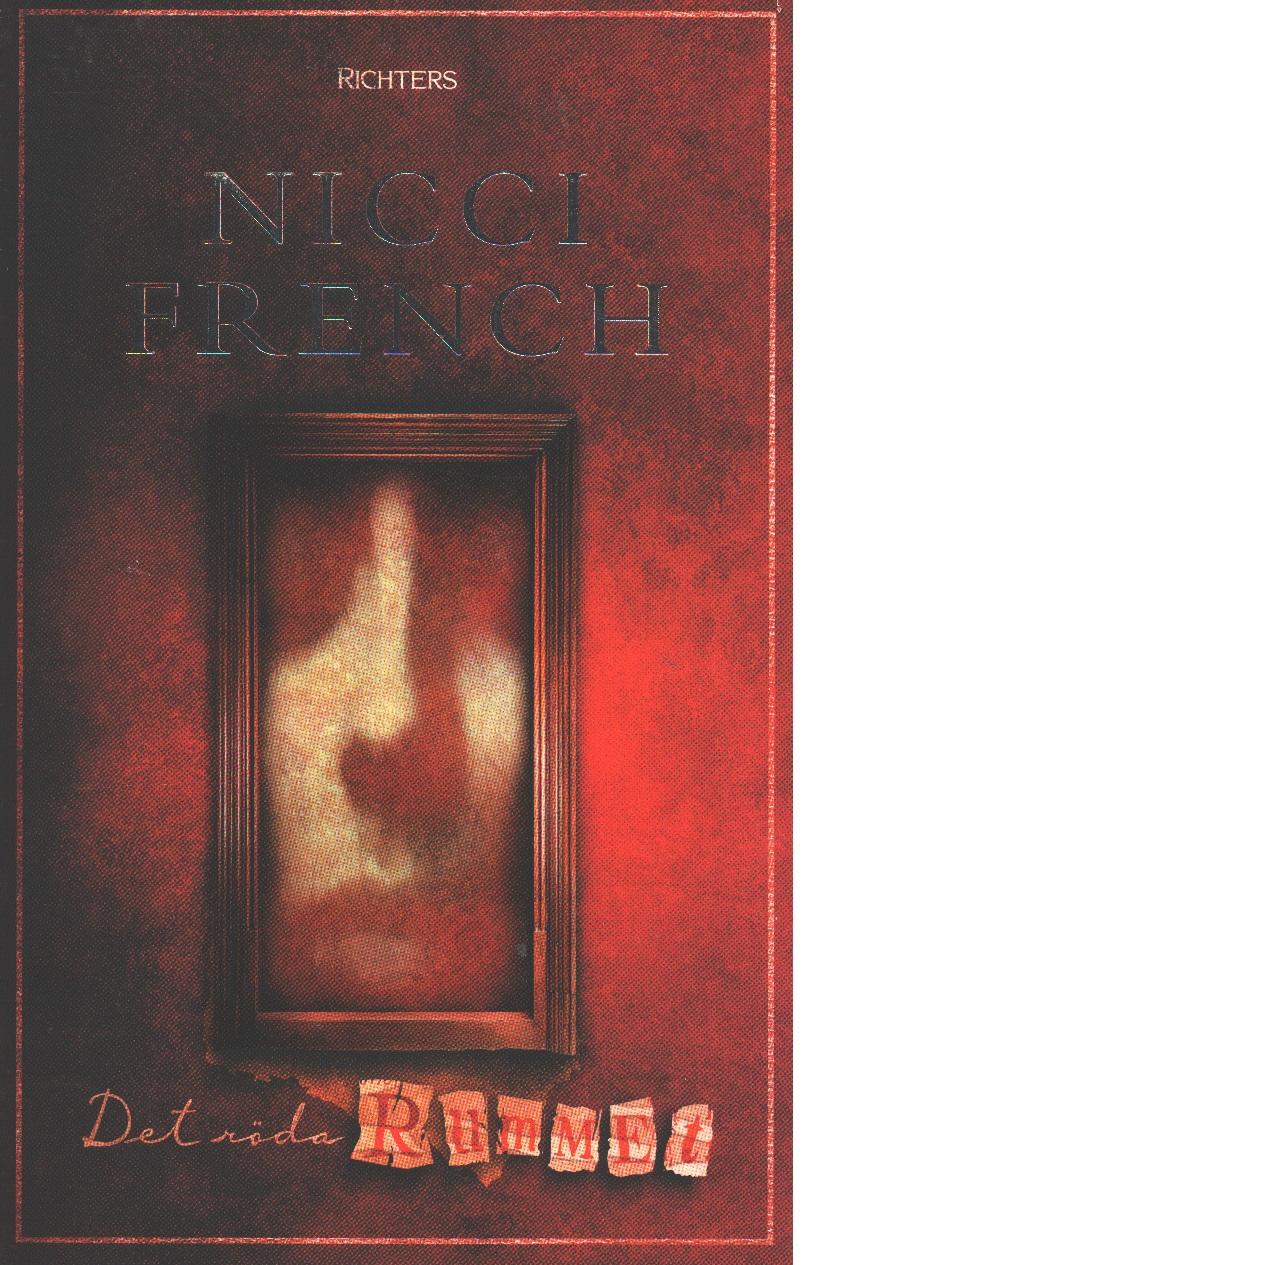 Det röda rummet - French, Nicci